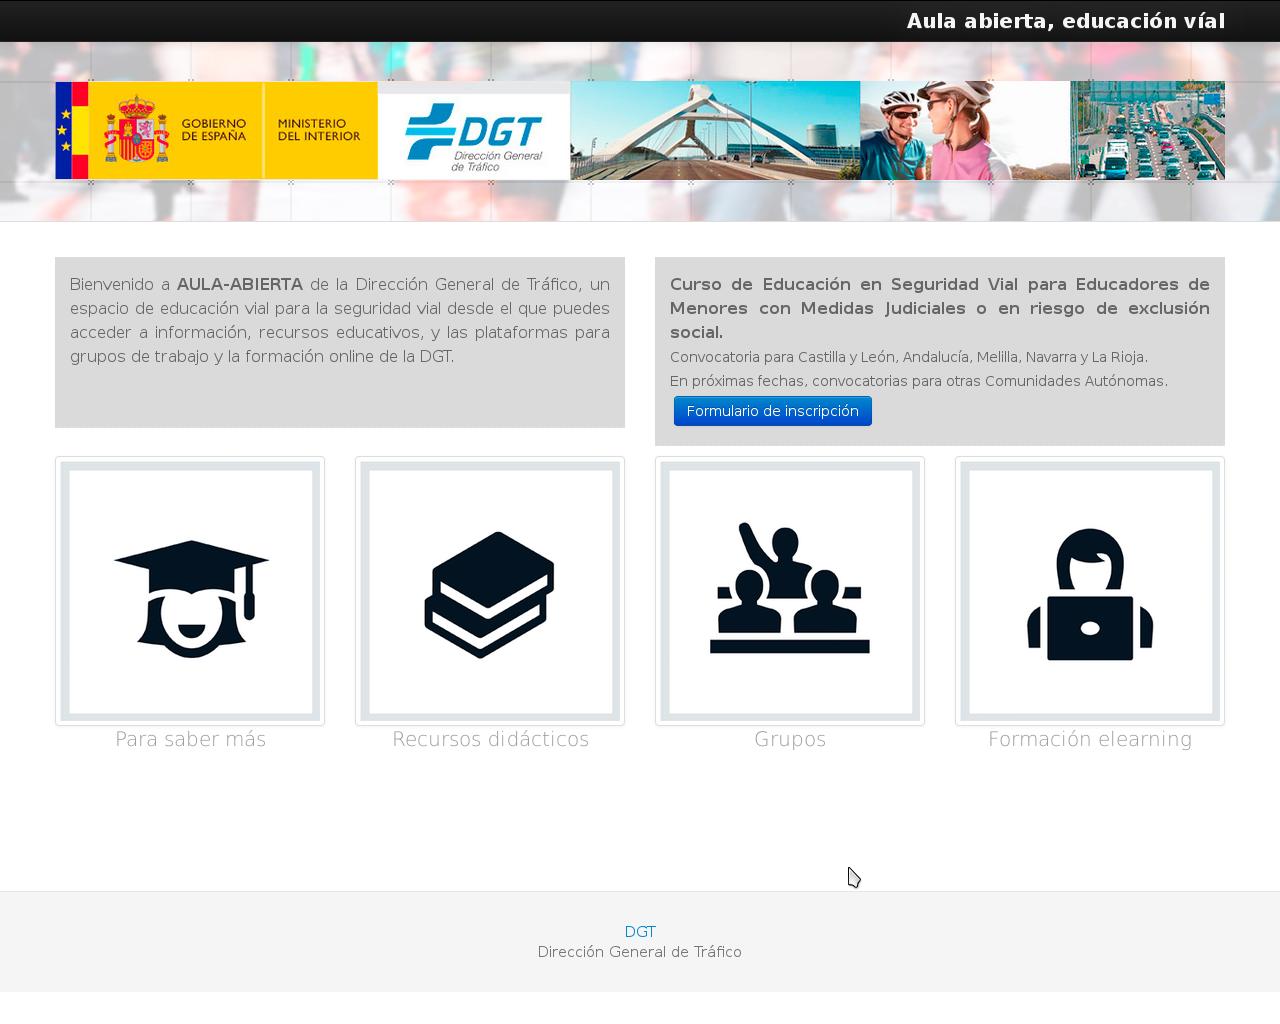 http://www.aula-abierta-dgt.es/